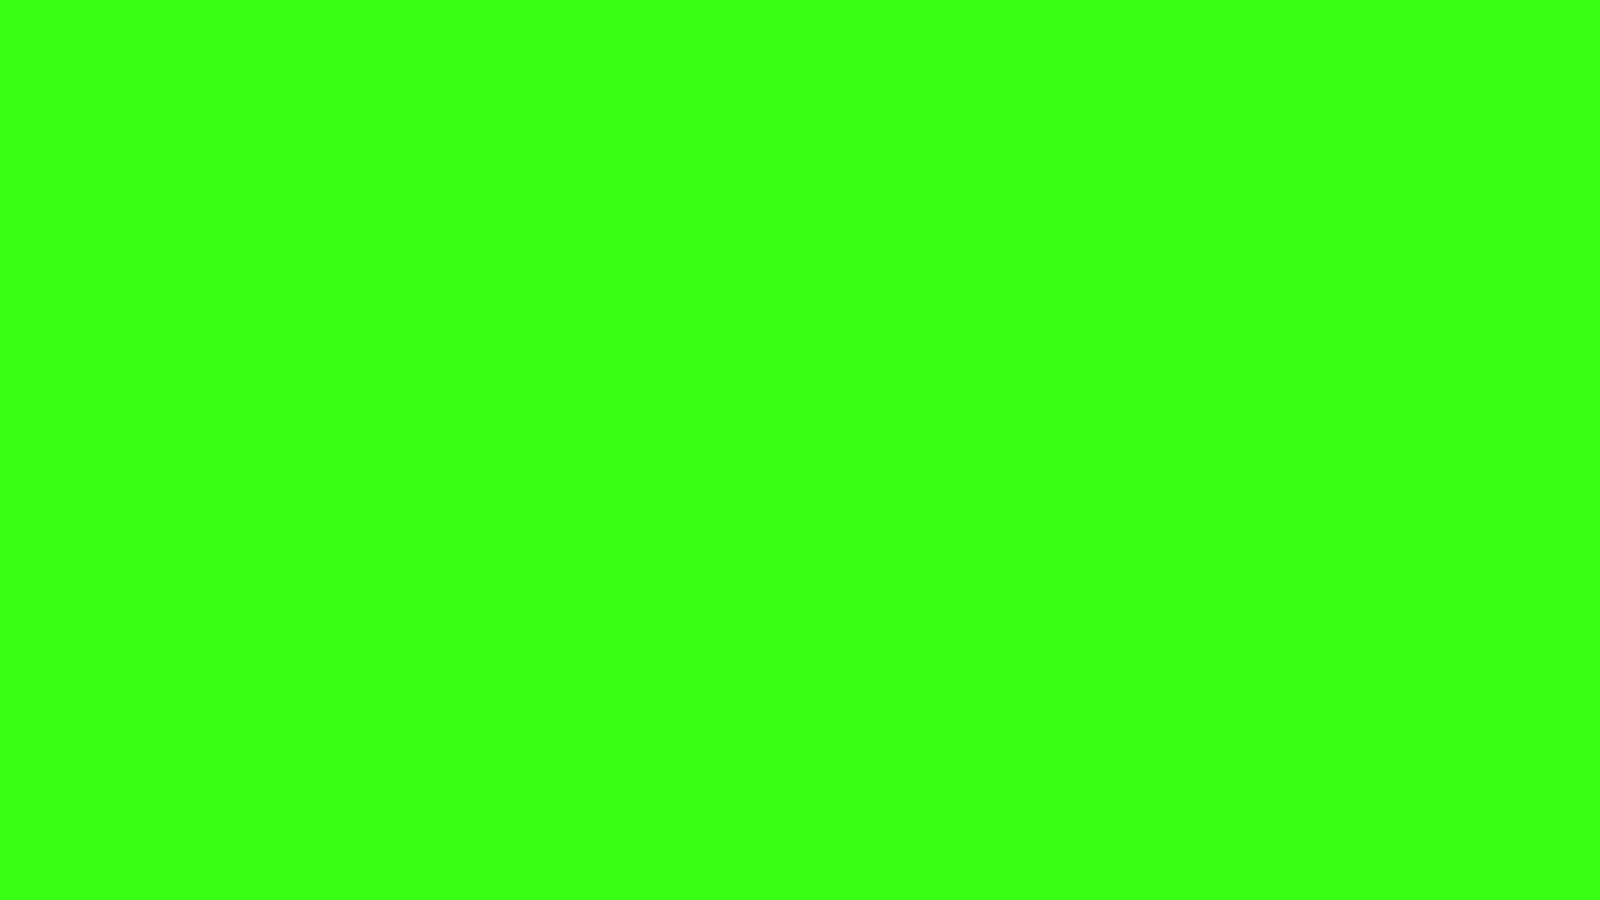 lime green backgrounds wallpapersafari